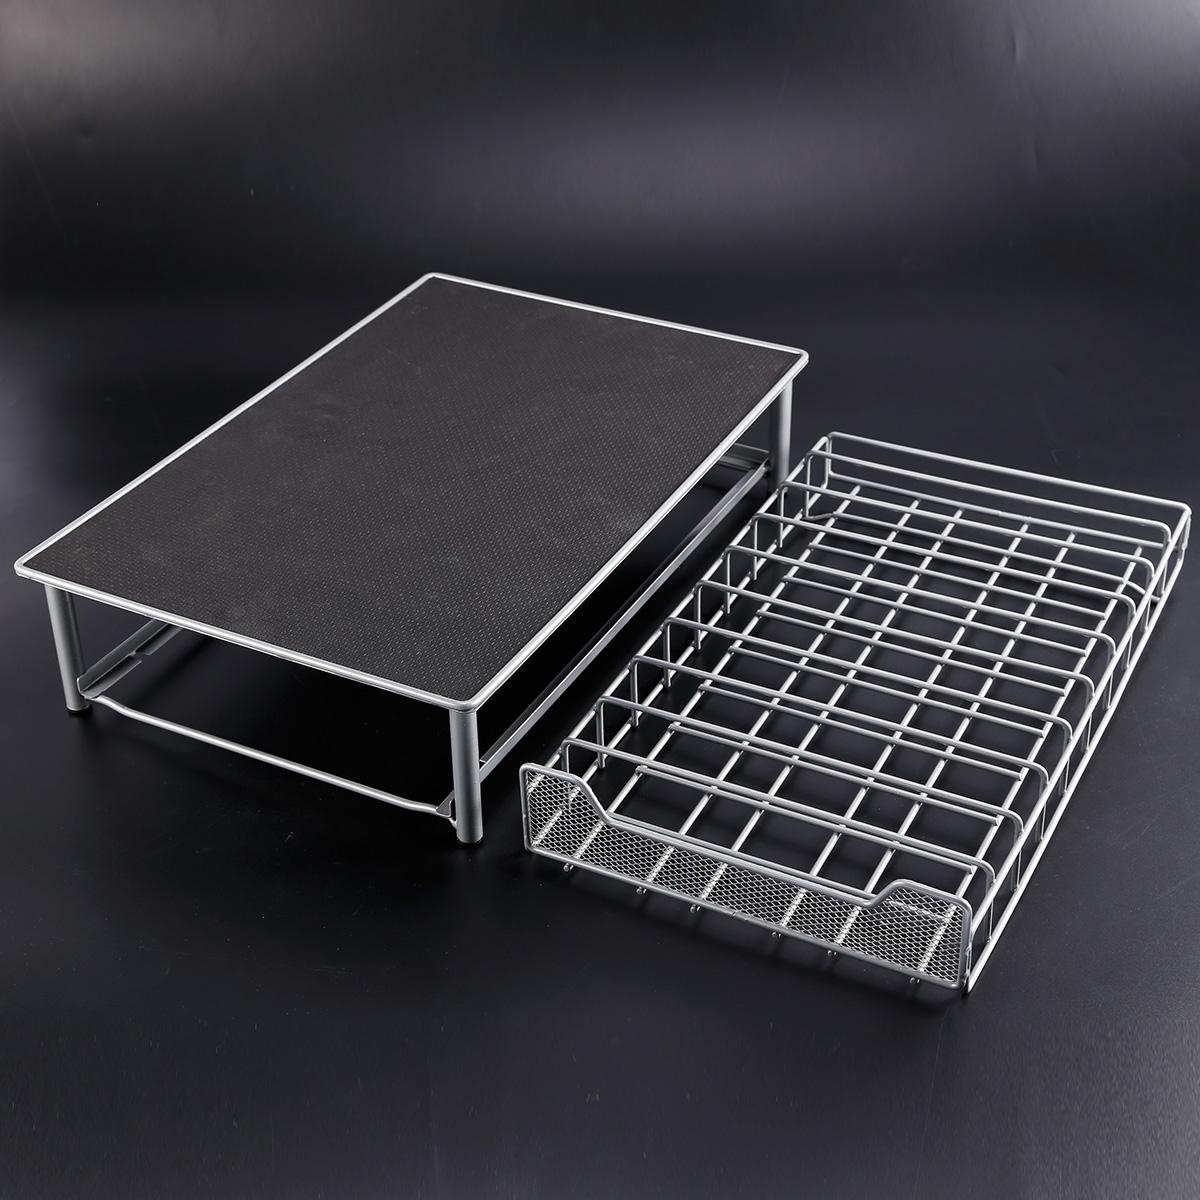 distributeur dosette porte 60 capsule de caf tassimo support tiroir filet m tal ebay. Black Bedroom Furniture Sets. Home Design Ideas